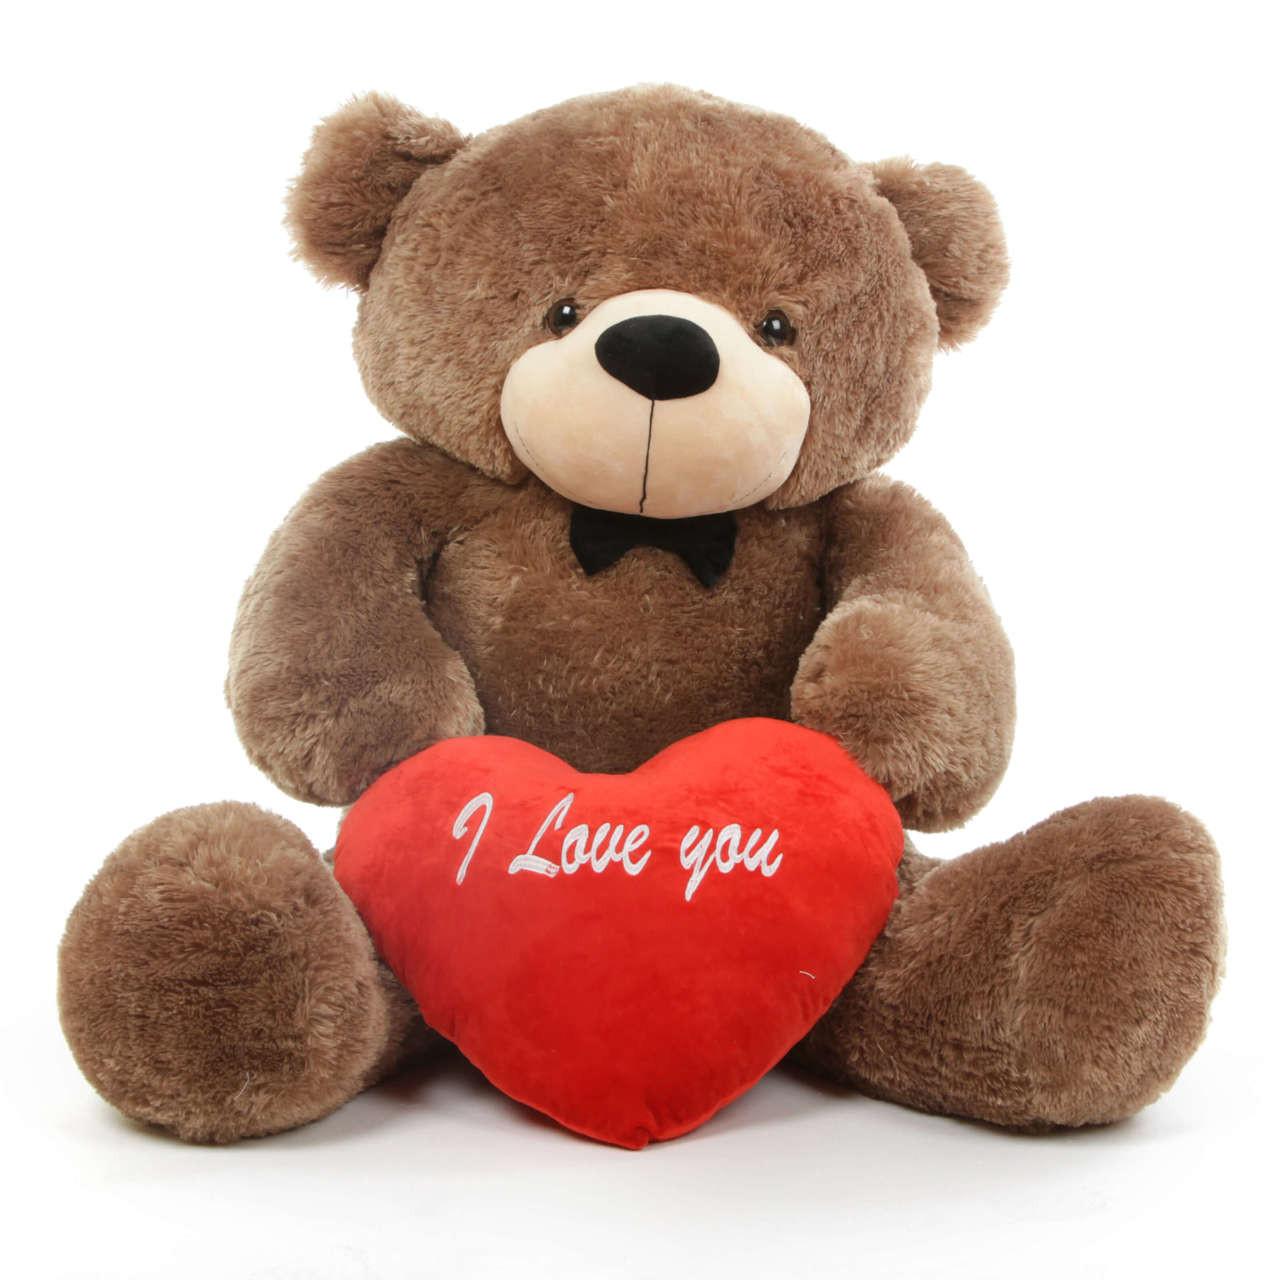 sunny l cuddles 48 mocha teddy bear w i love you heart giant teddy bears. Black Bedroom Furniture Sets. Home Design Ideas